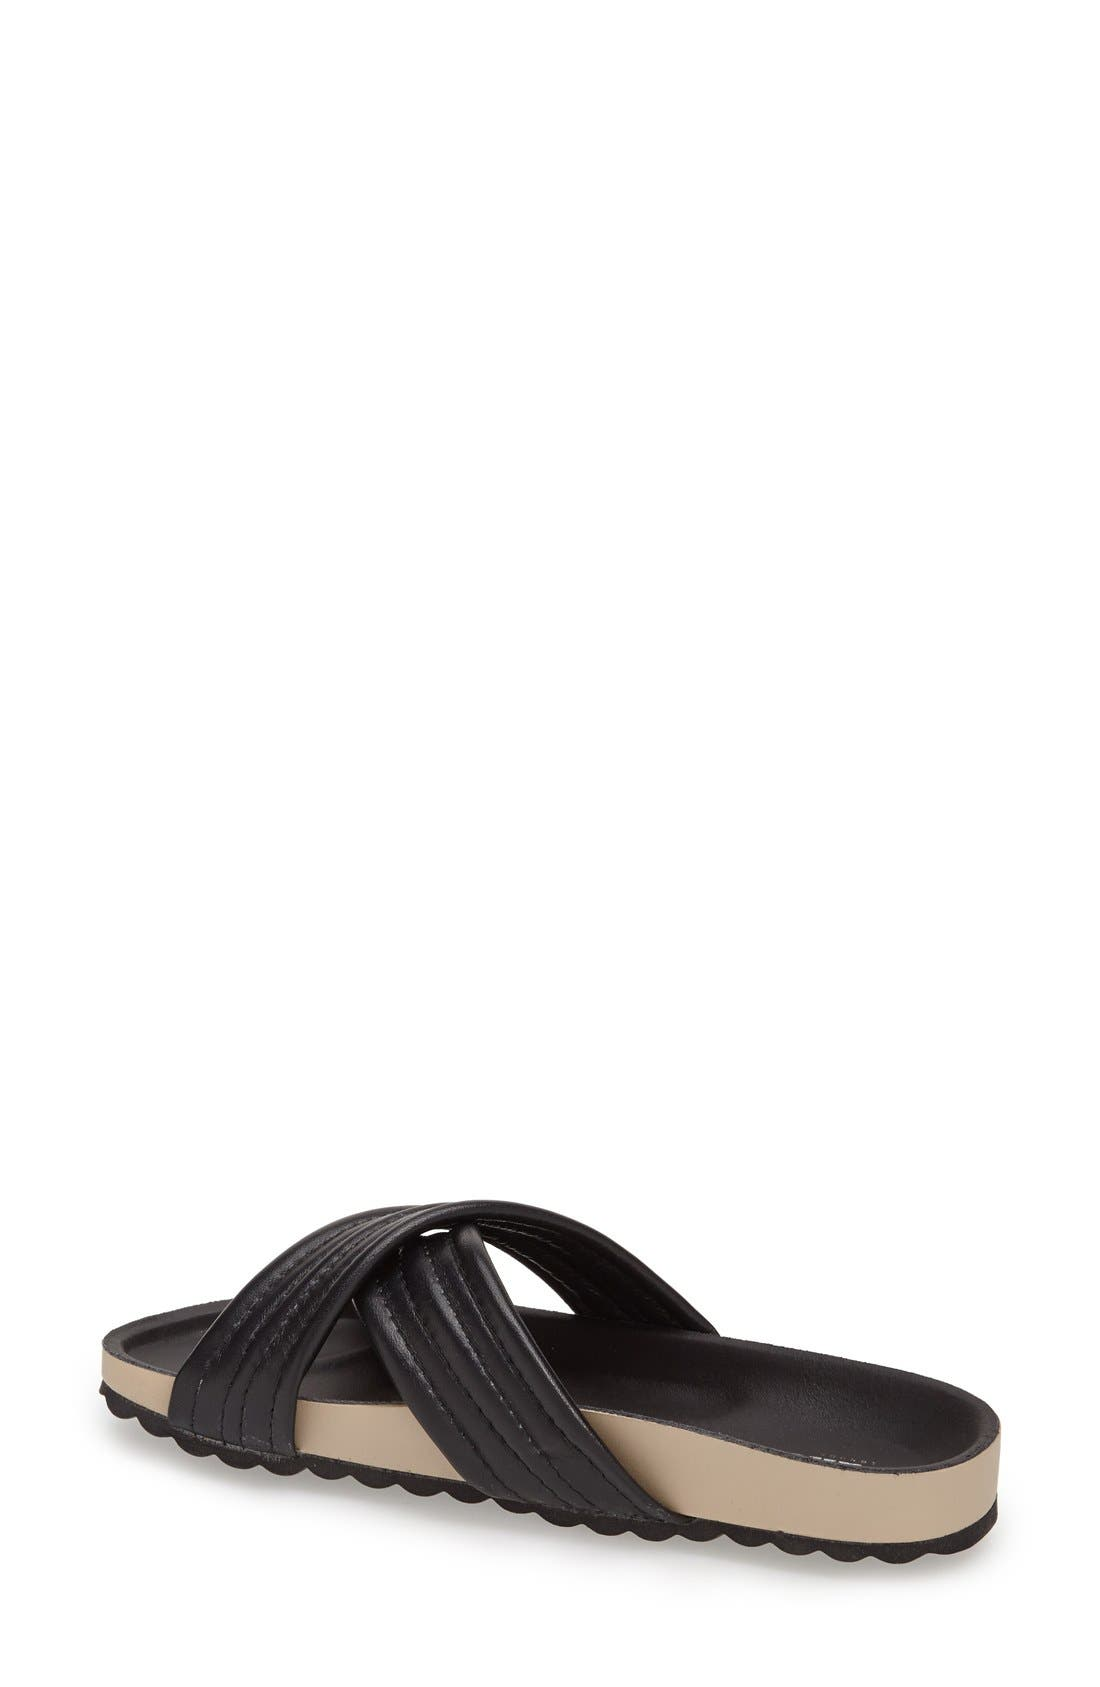 DUNE LONDON, 'Jolenes' Leather Slide Sandal, Alternate thumbnail 2, color, 002